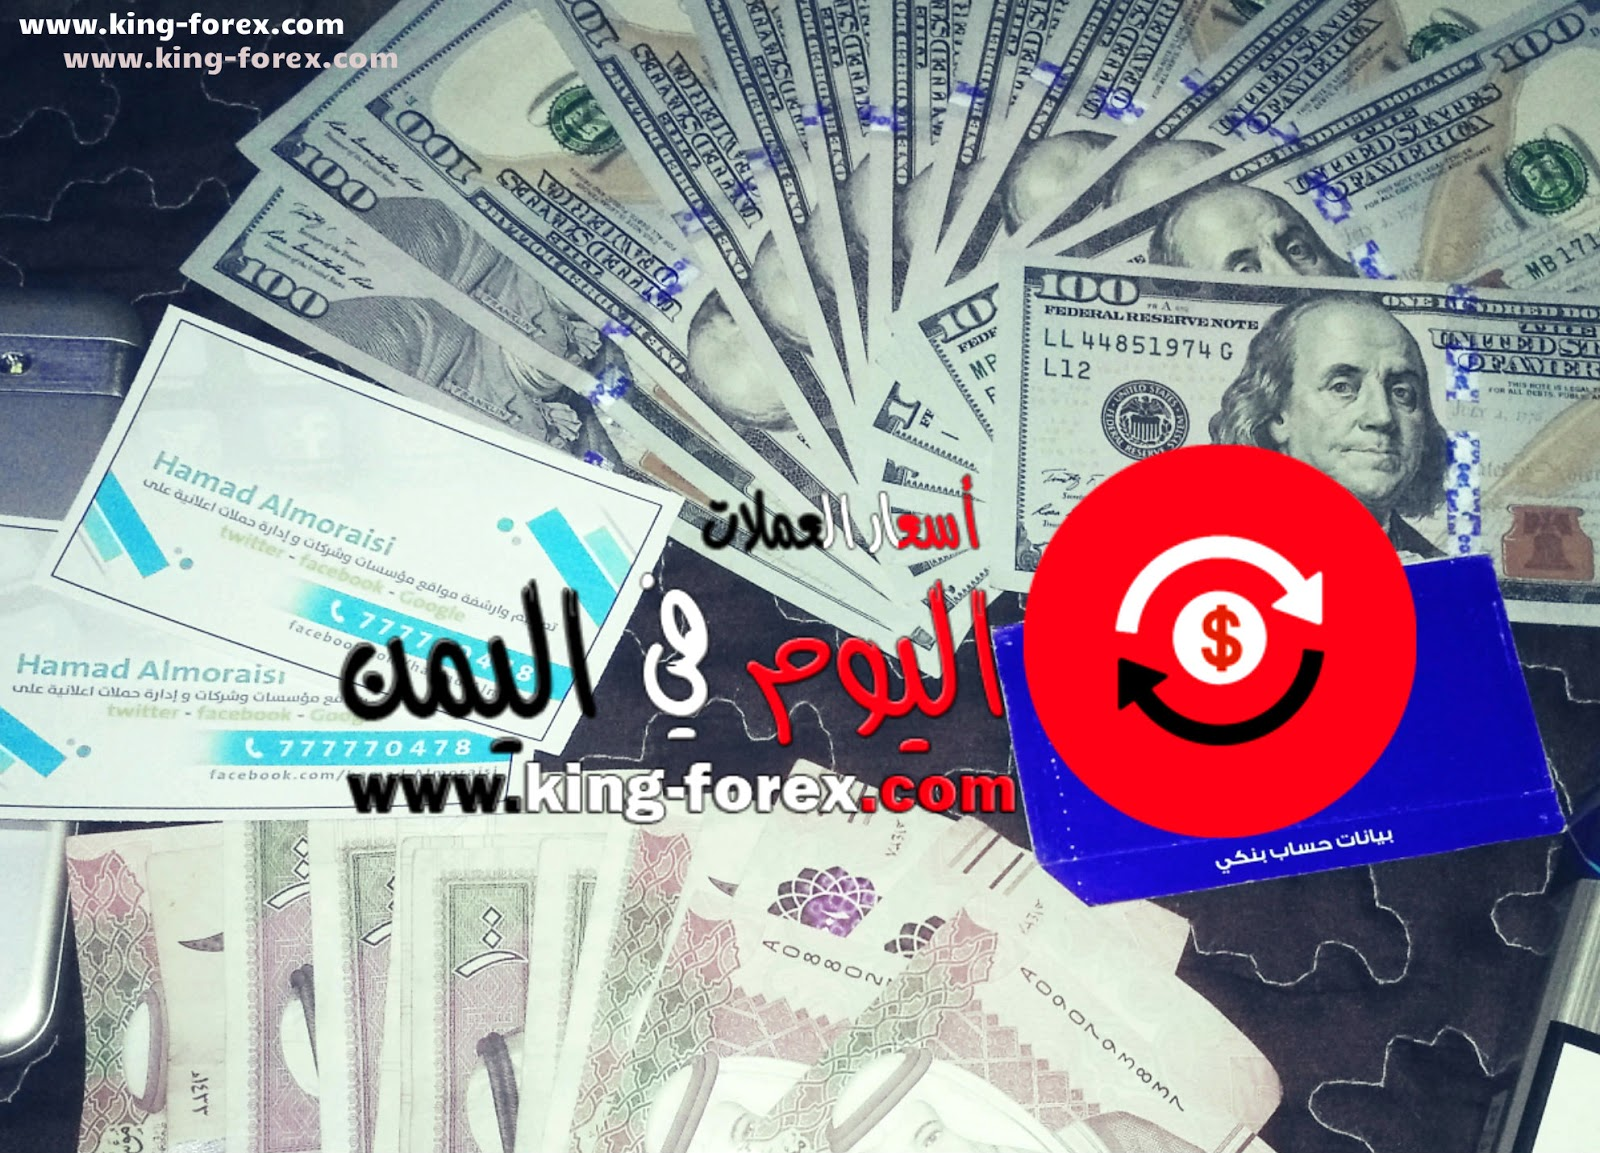 7d90e9a9170af اسعار العملات اليوم في اليمن مقابل الريال اليمني